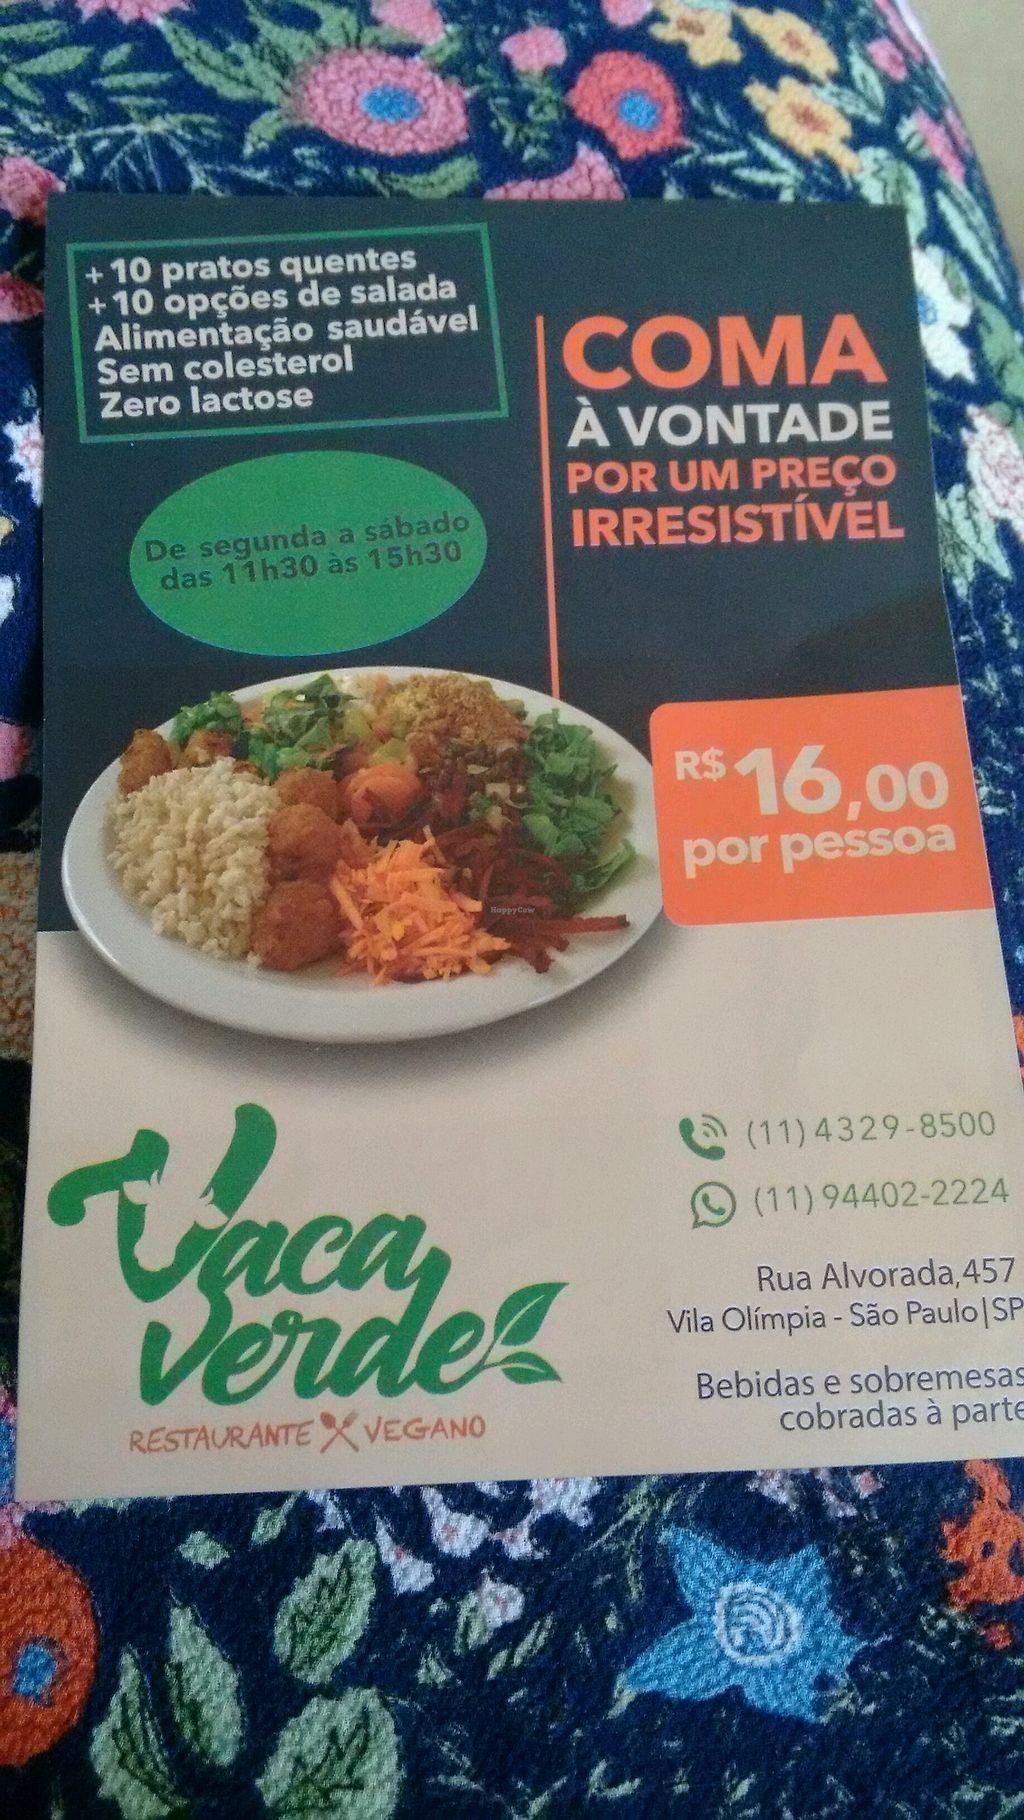 "Photo of Vaca Verde  by <a href=""/members/profile/tmorinaga"">tmorinaga</a> <br/>panfleto <br/> September 18, 2017  - <a href='/contact/abuse/image/96508/305792'>Report</a>"